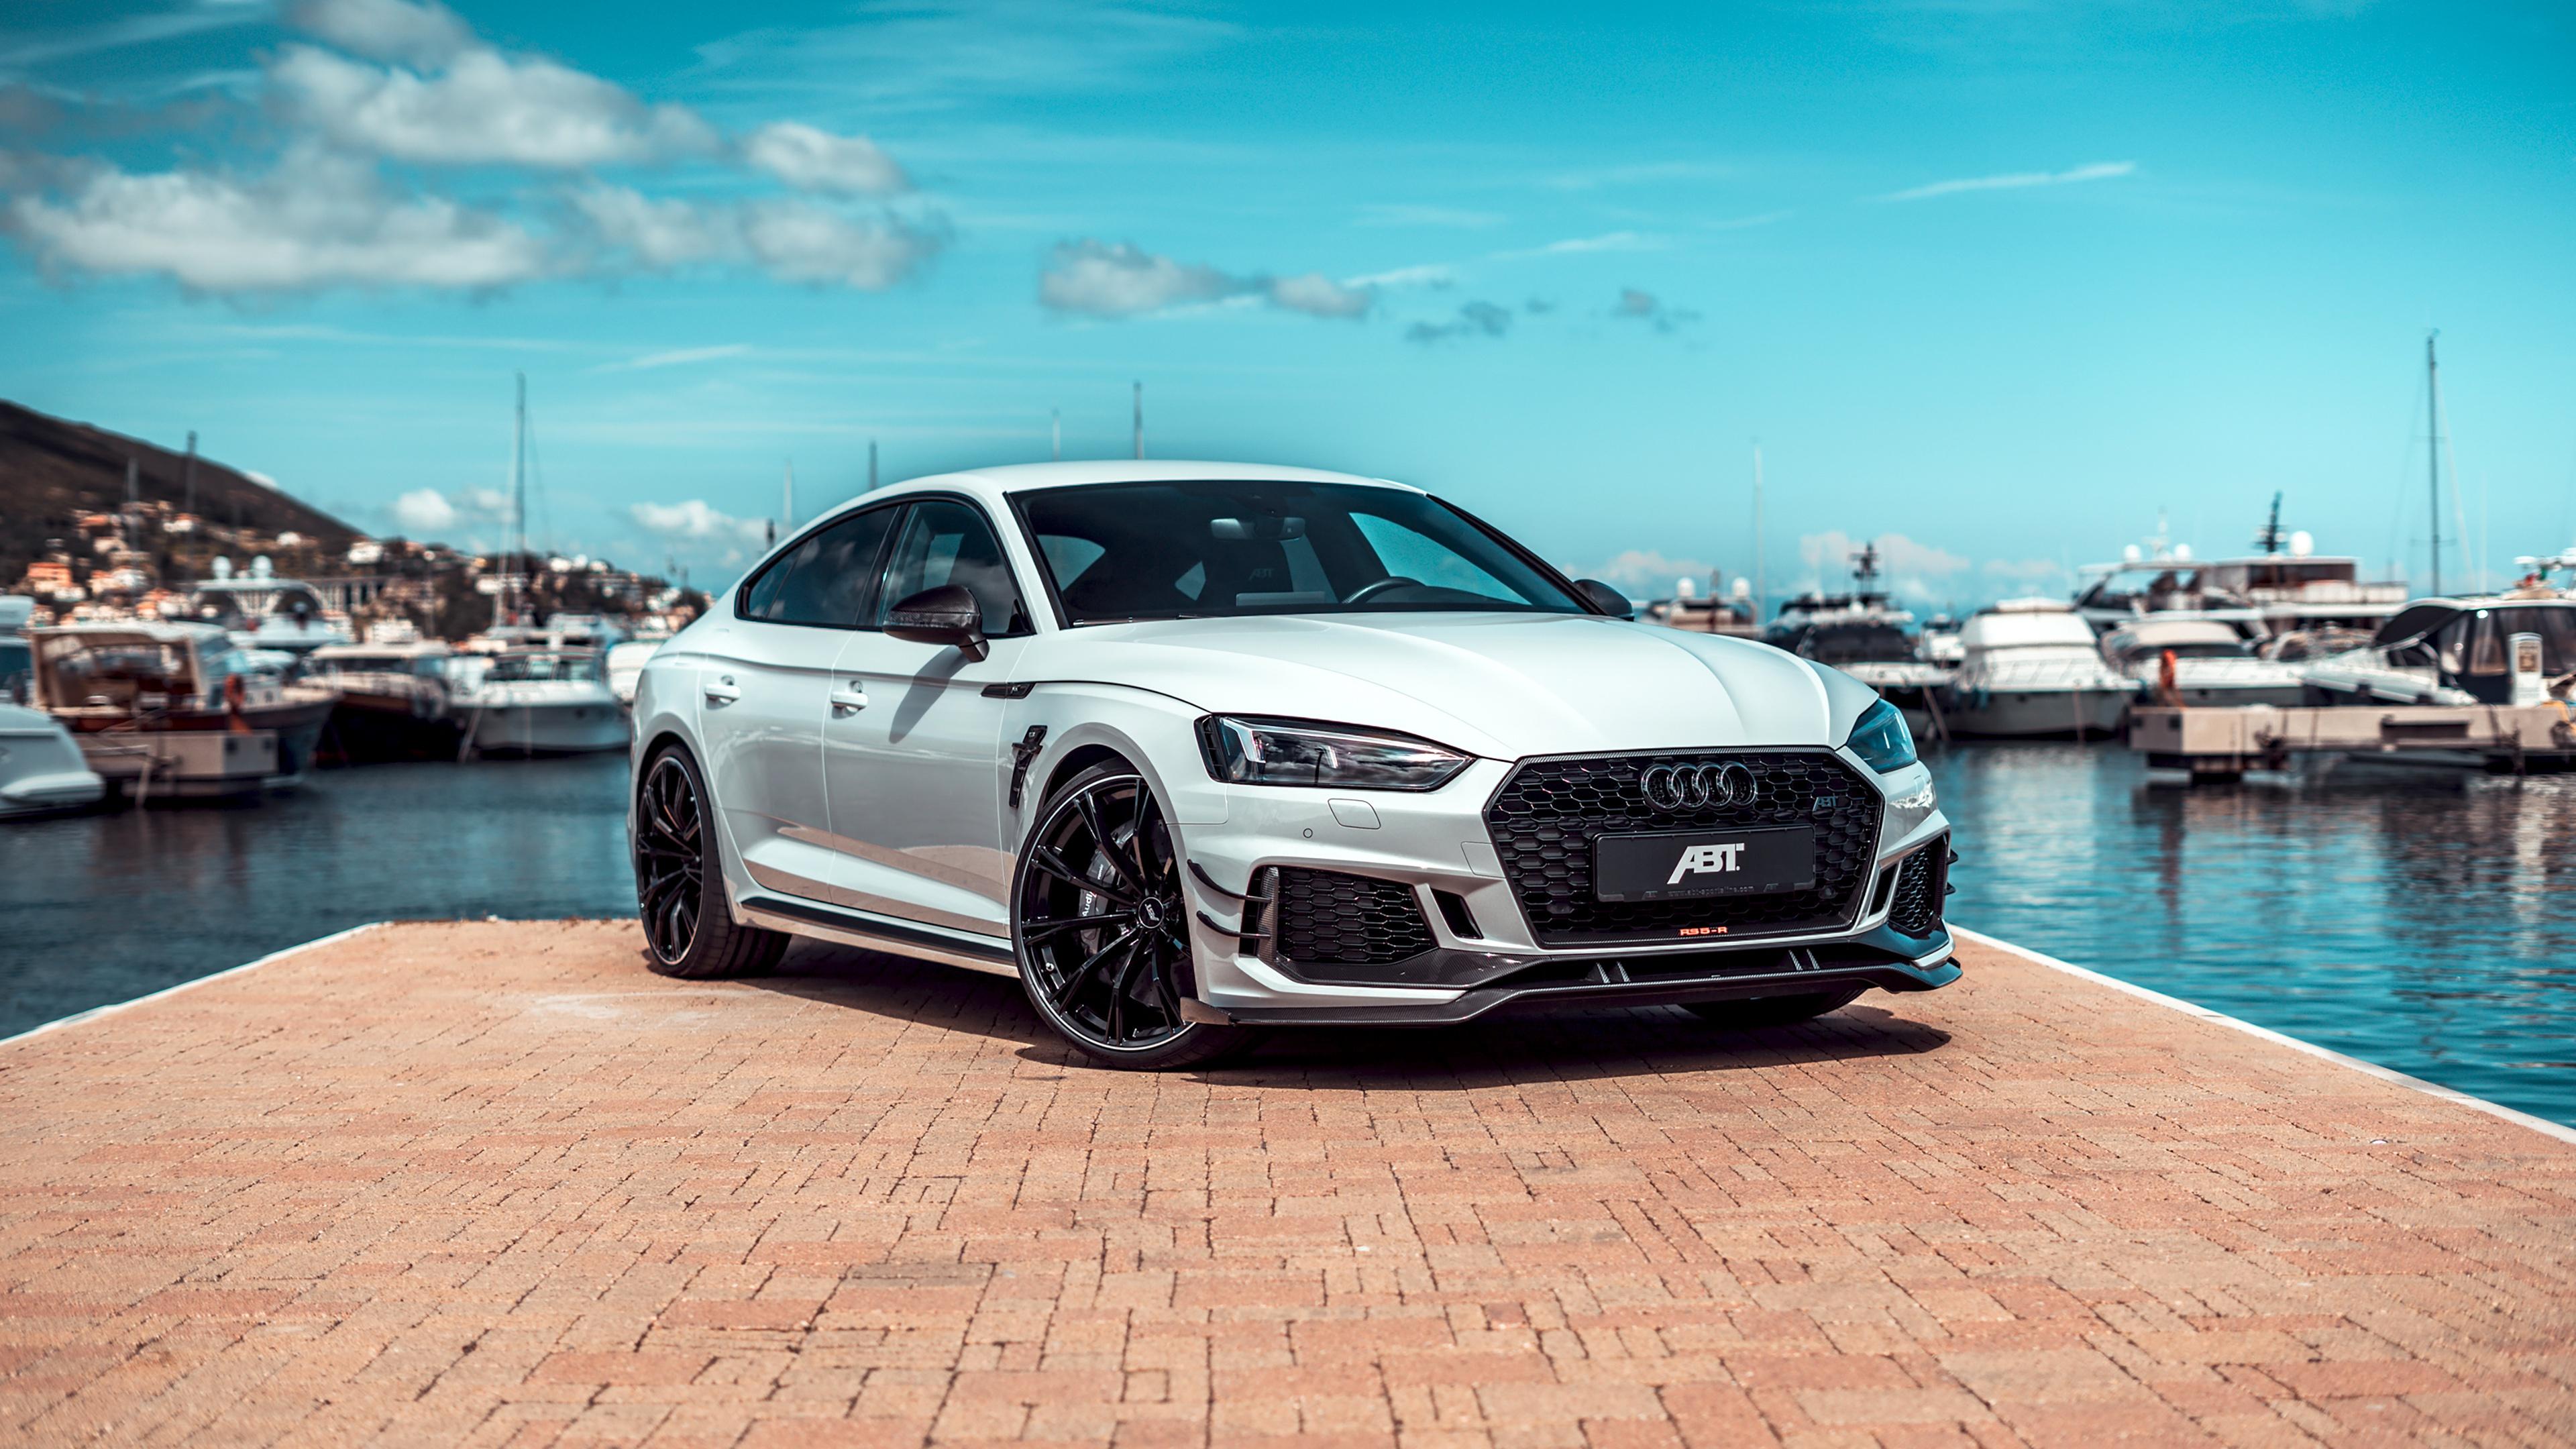 Audi Rs5 4k Ultra Papel De Parede Hd Plano De Fundo 3840x2160 Id 1036316 Wallpaper Abyss